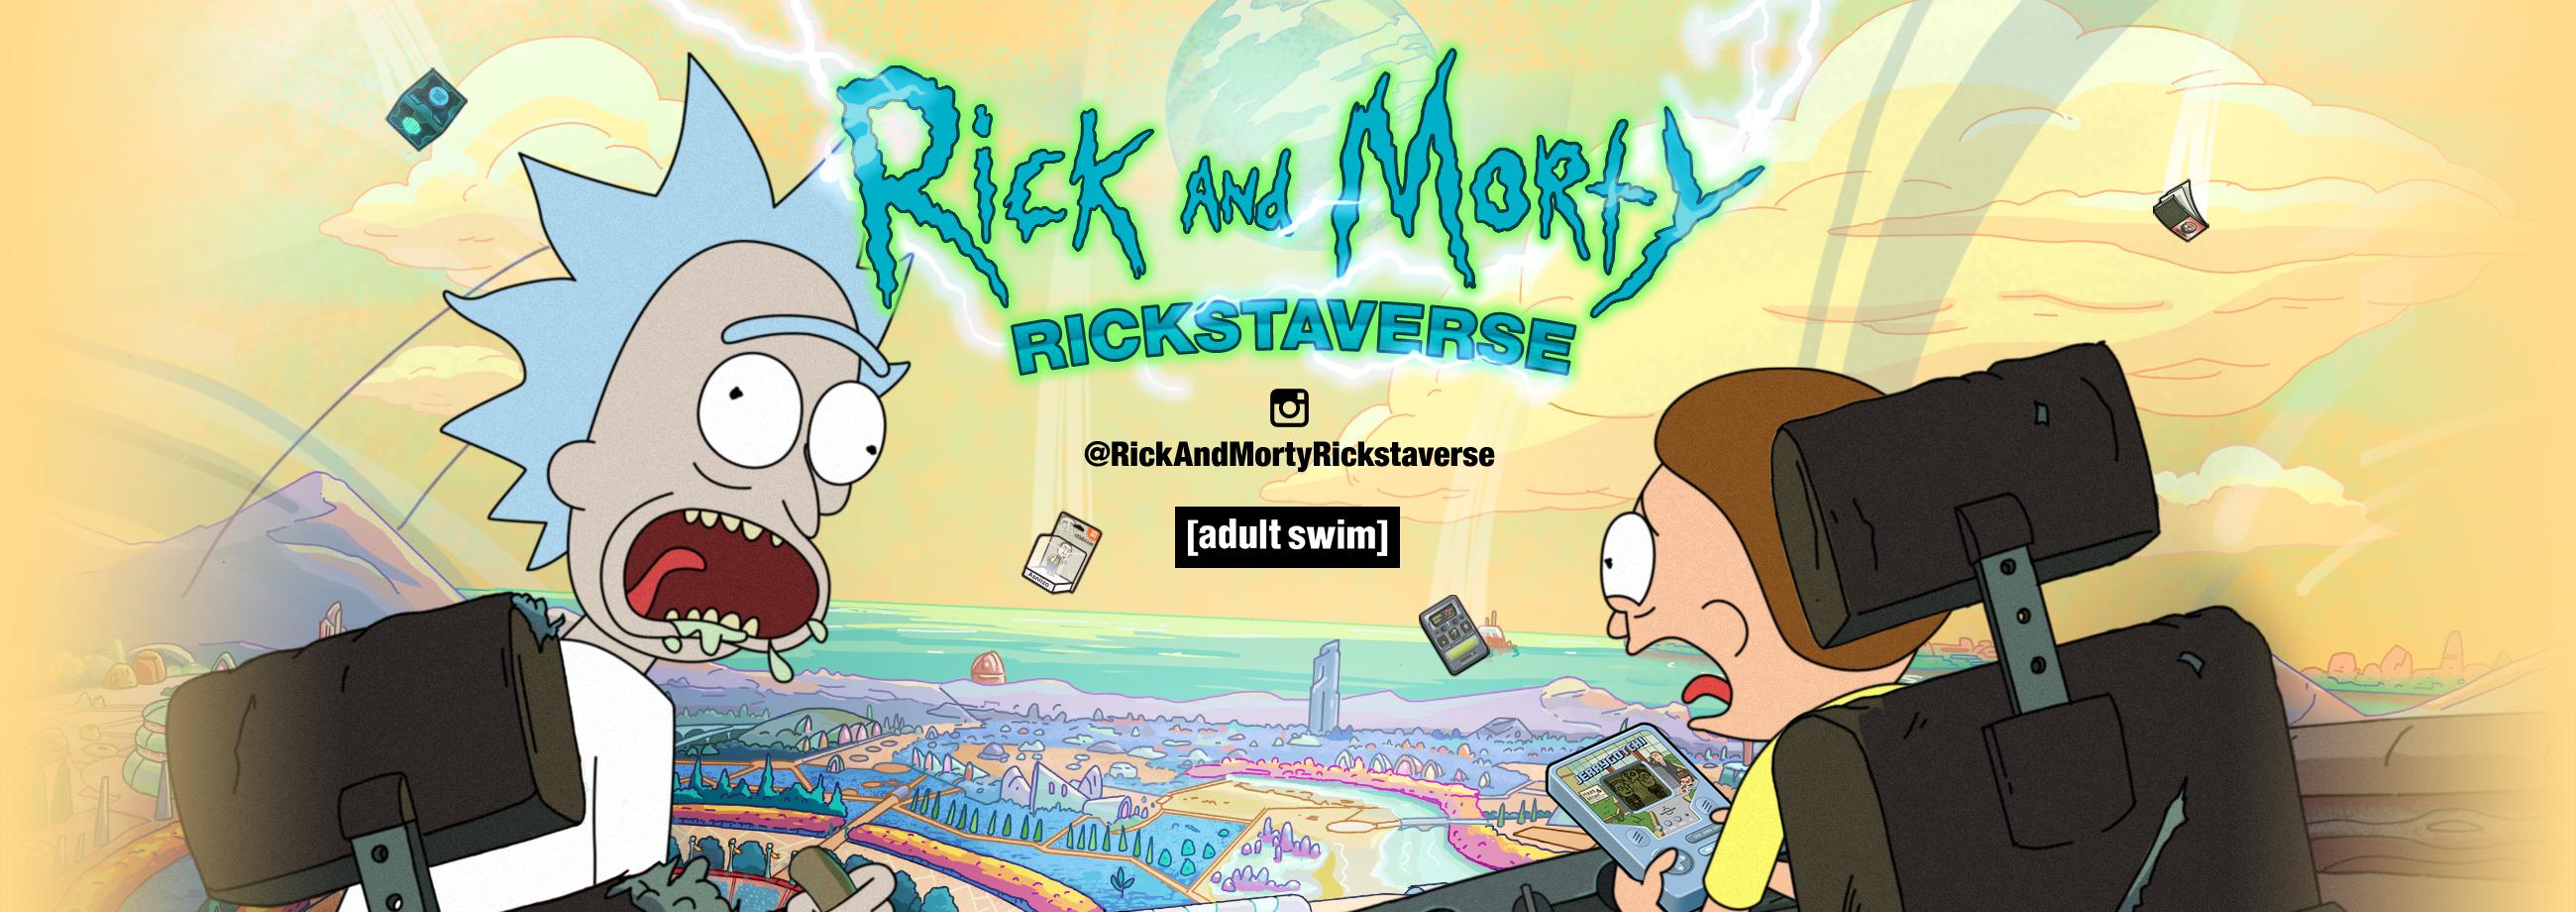 rick_and_morty.jpg